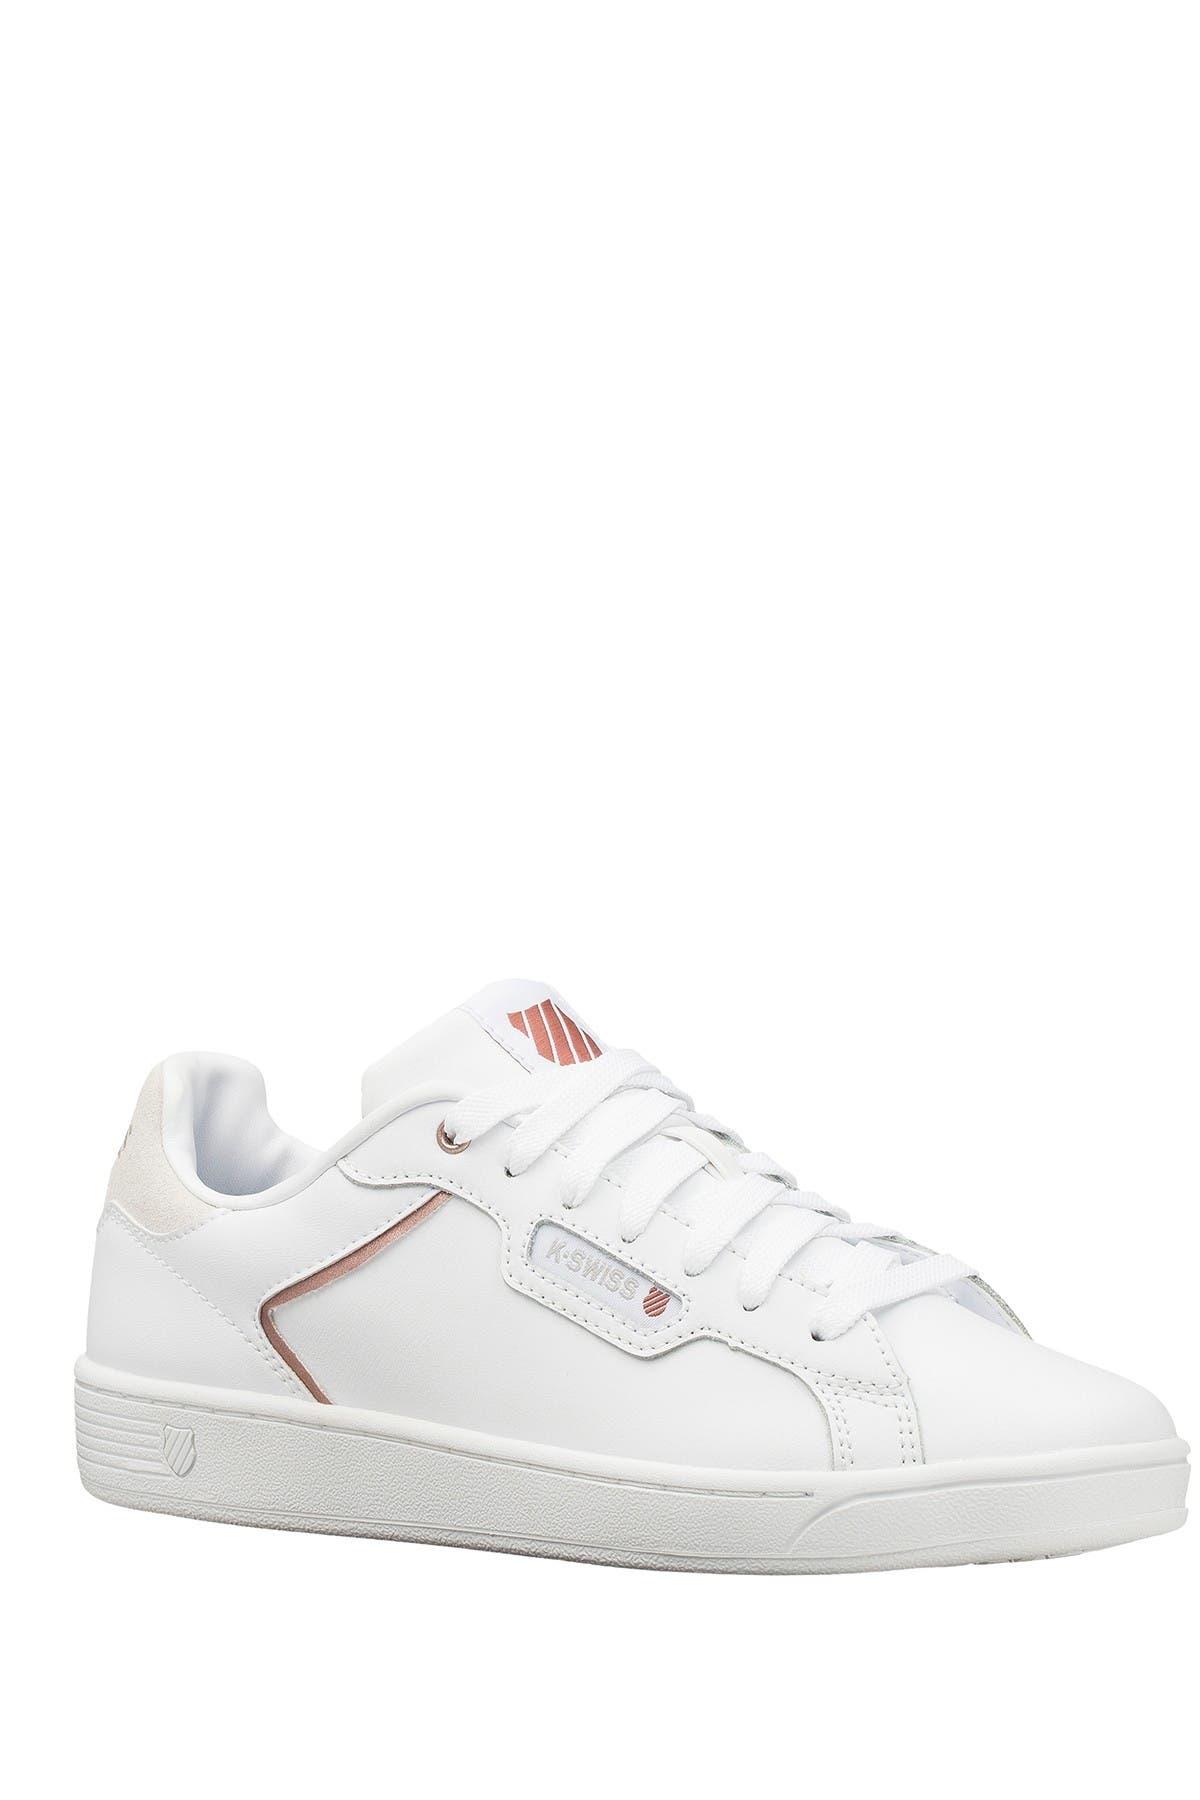 Image of K-Swiss Clean Court II CMF Leather Sneaker